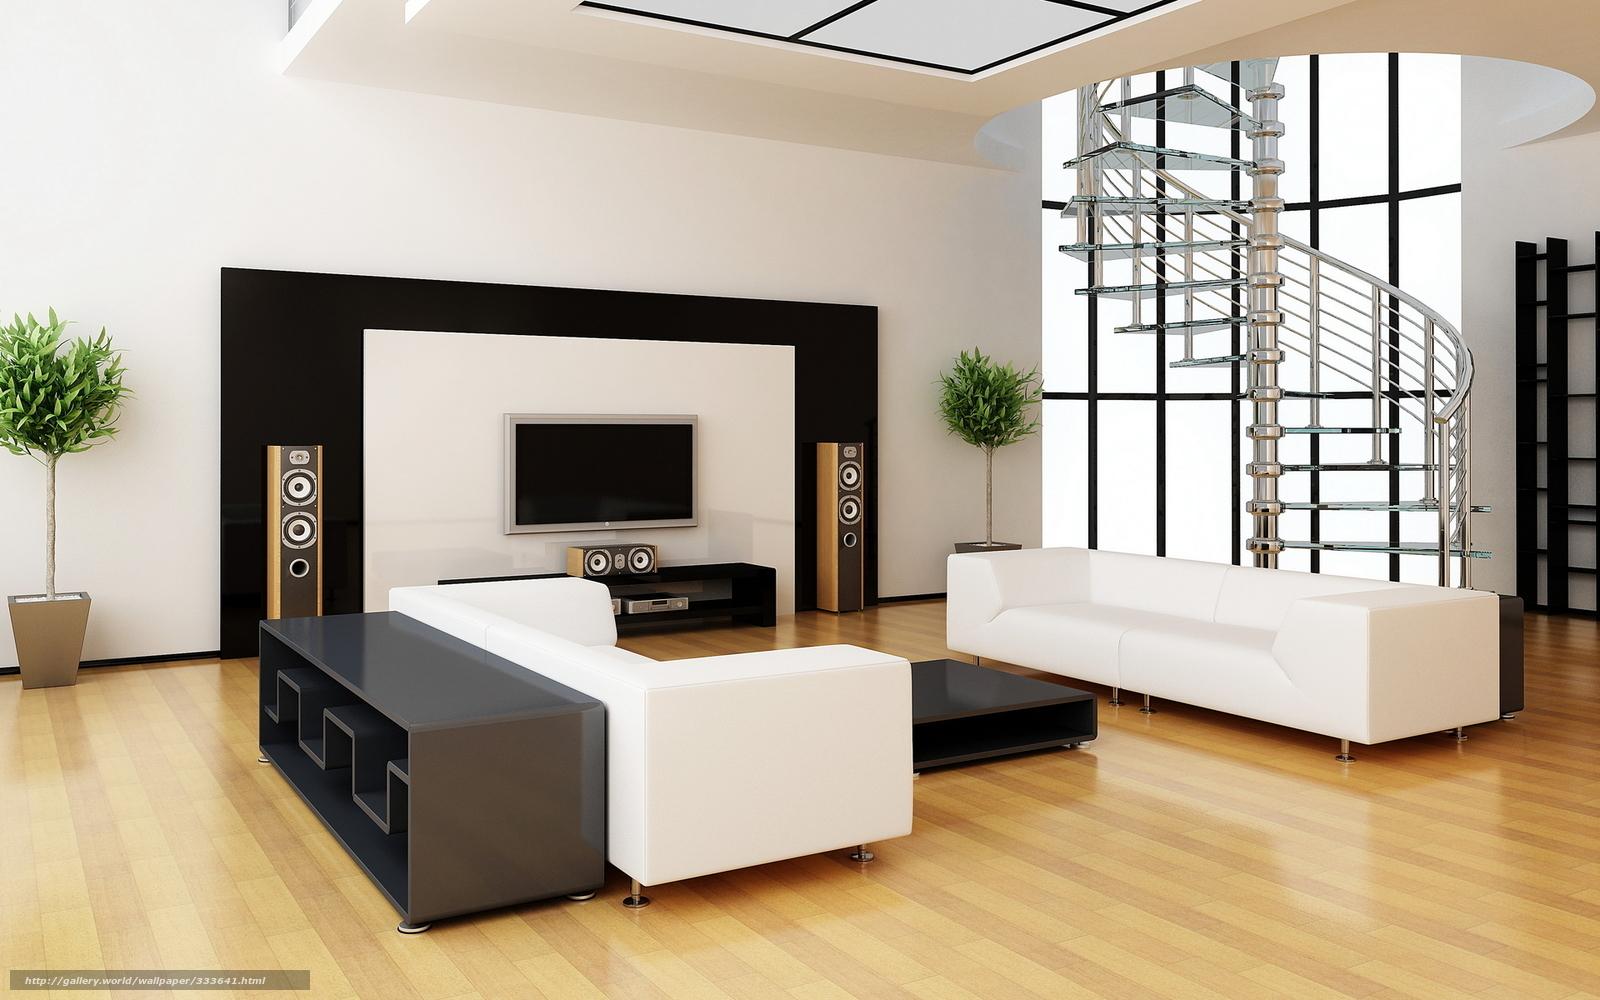 Interr Sala Apartamento Projeto Estilo Aparelho De Som Sof  -> Vasos Na Sala De Tv